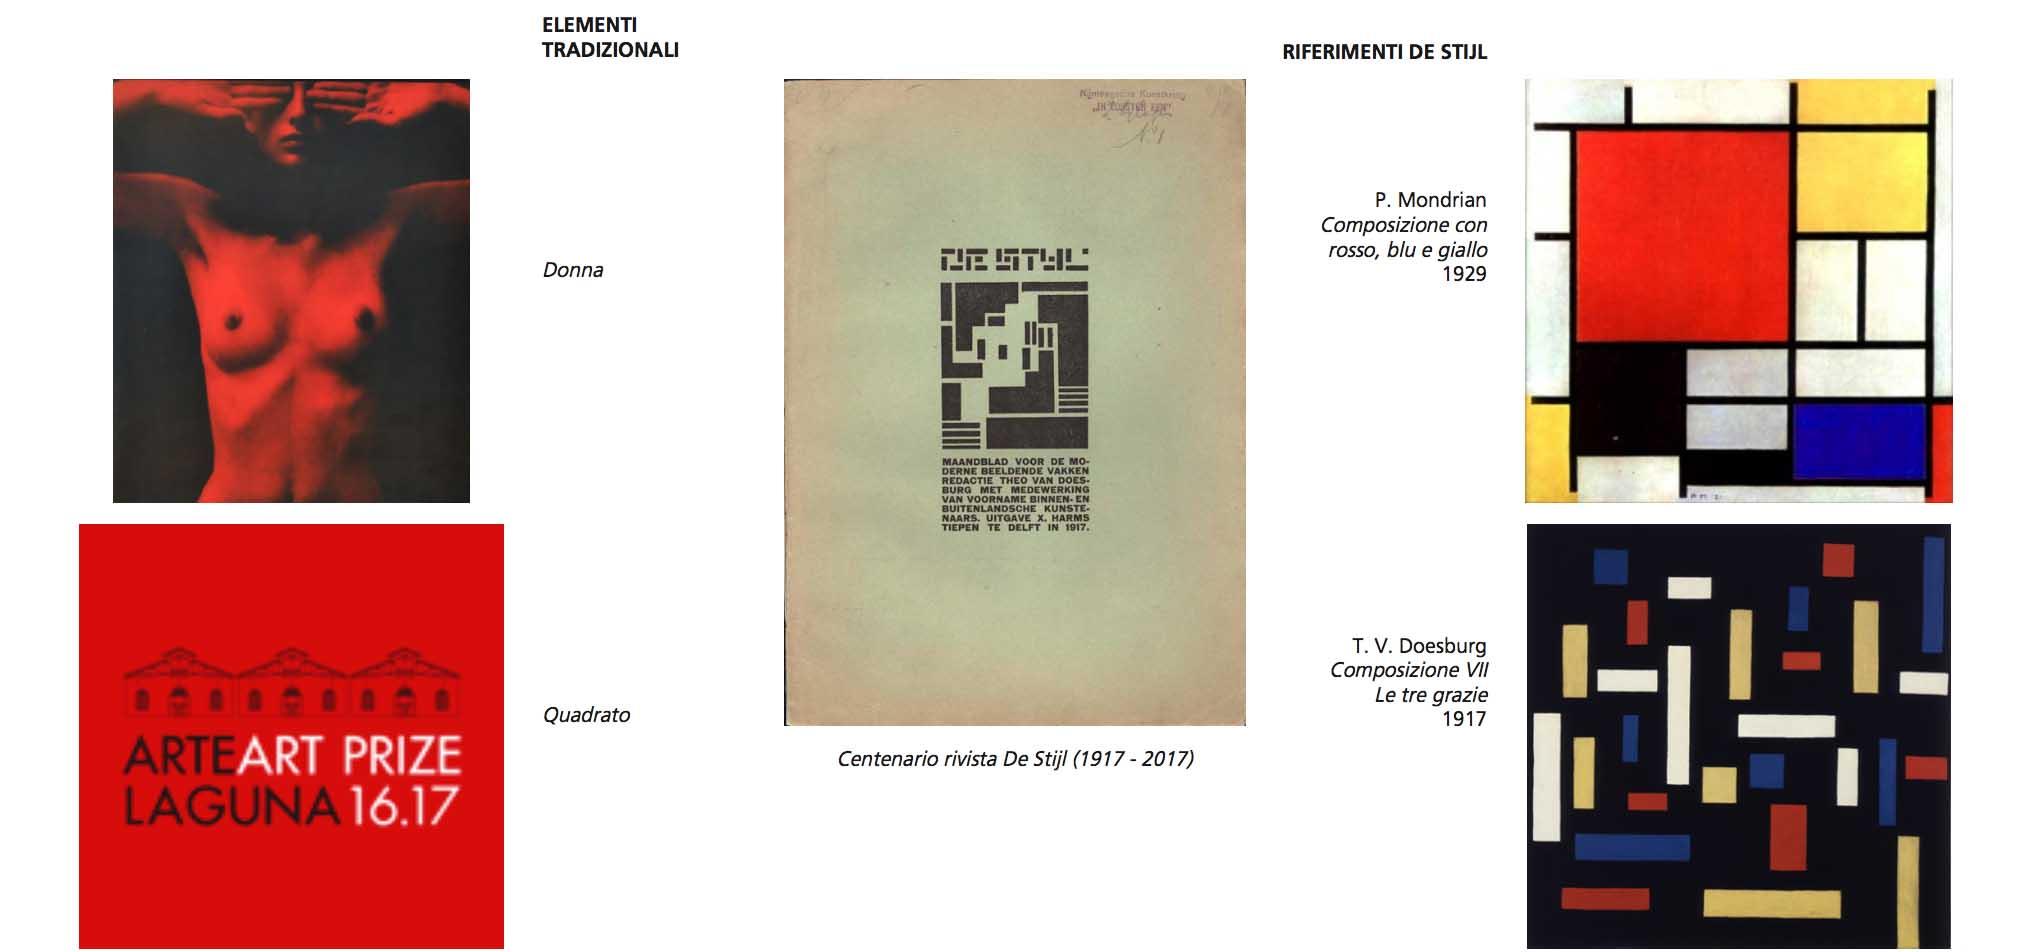 Antonio Polato IUSVE - Arte laguna brief 2016